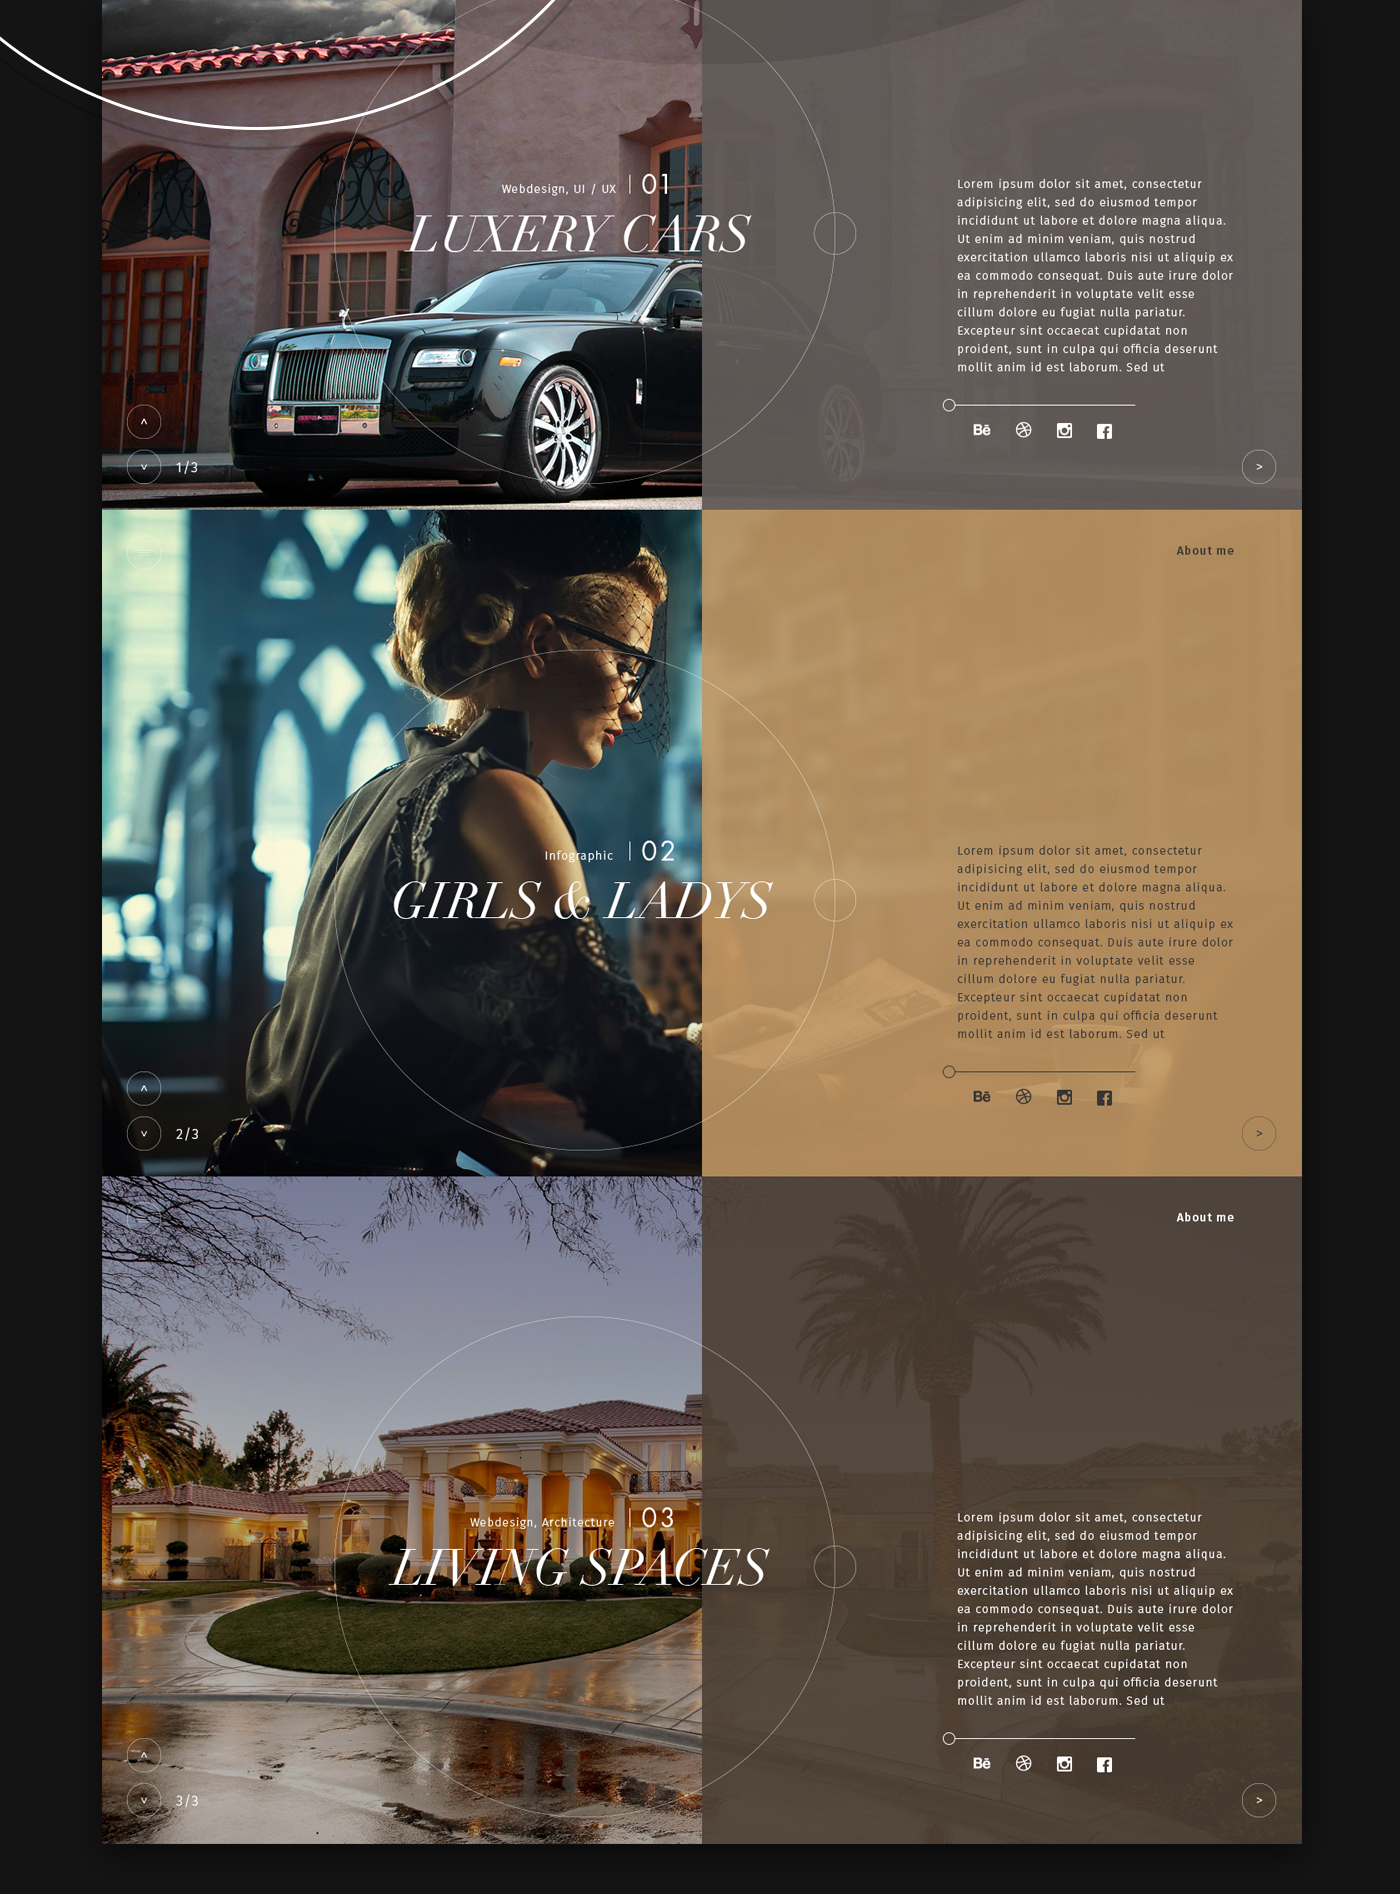 consilium free psd freebie Webdesign HTML css photoshop